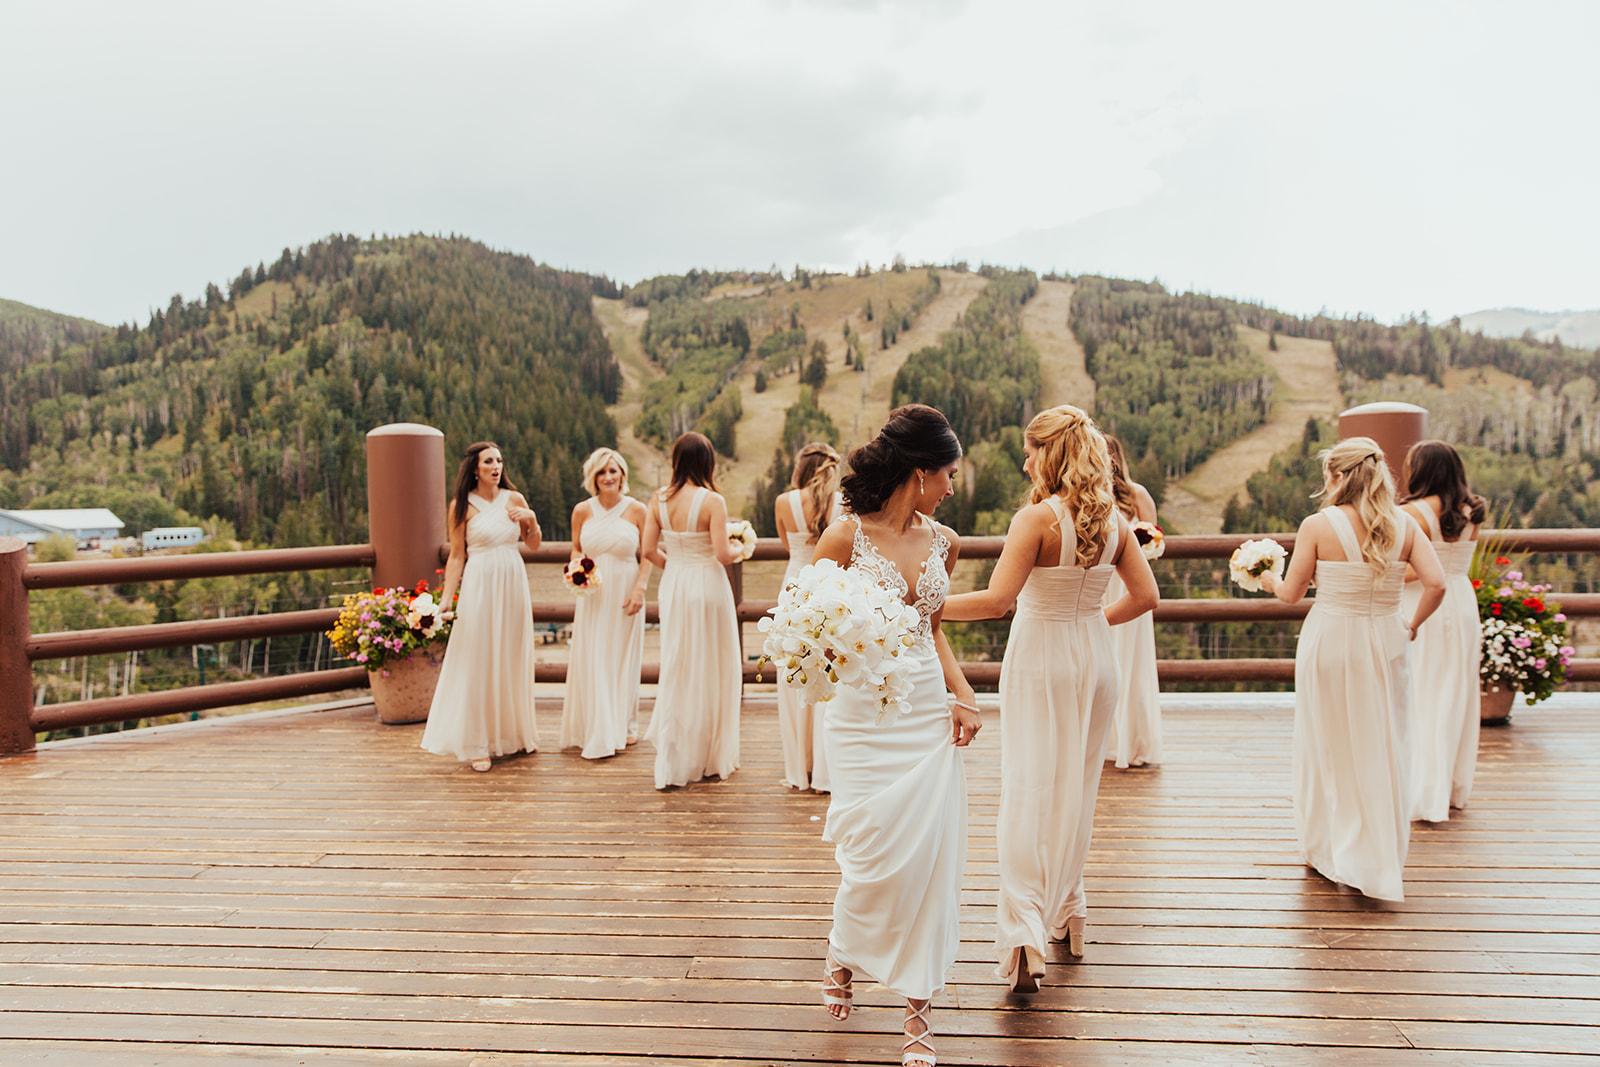 Photo: Brogen Jessup  Florist: Artisan Bloom  Planning: Something Lovely Weddings